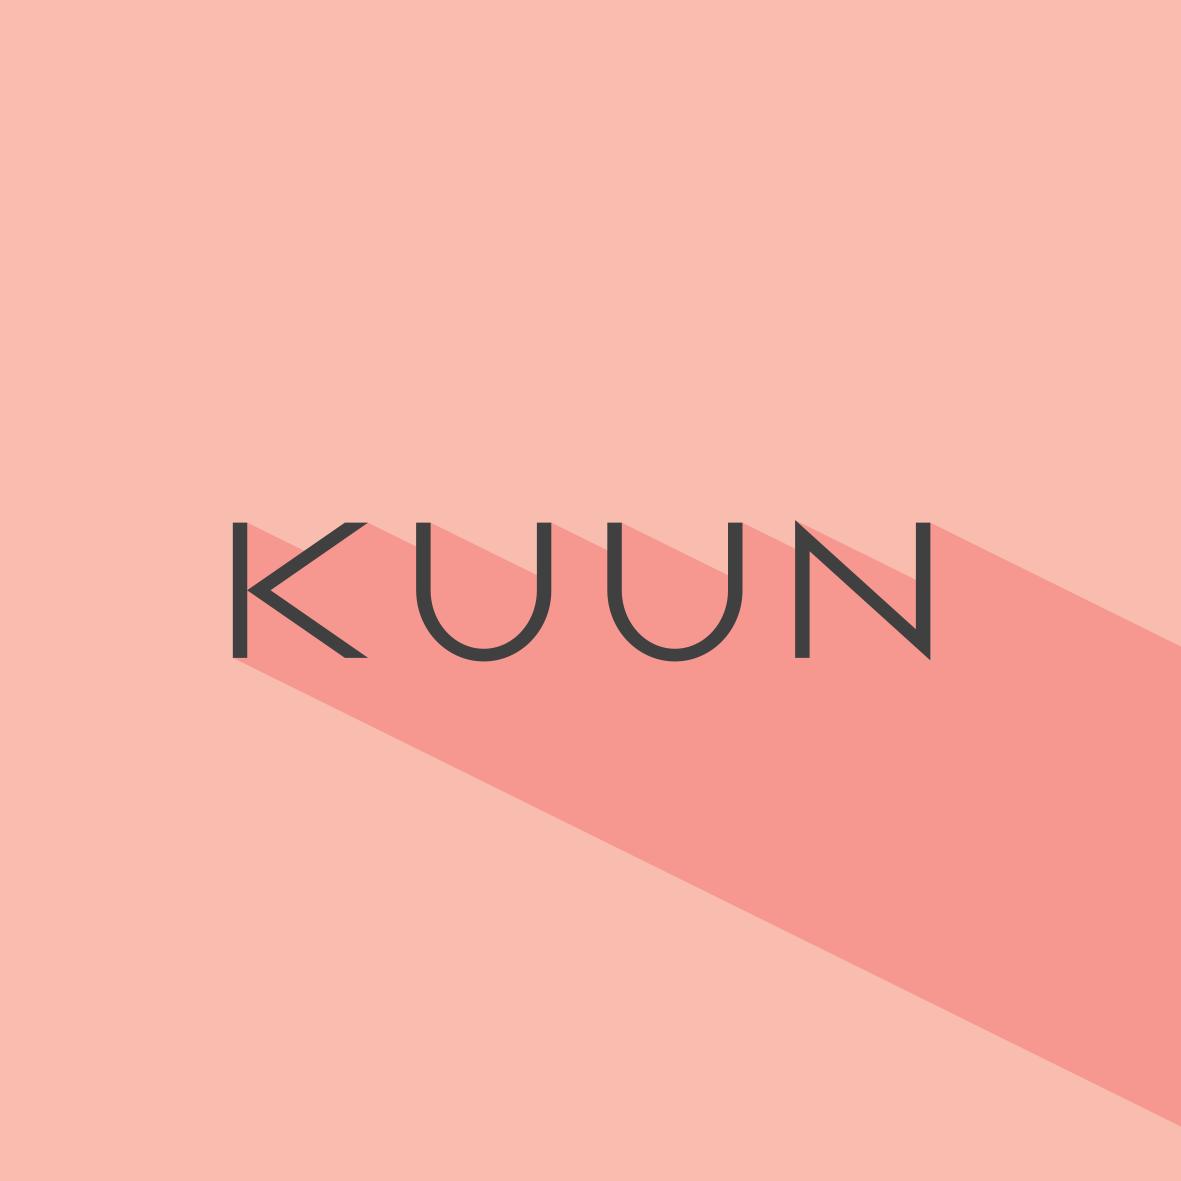 KUUN design logo